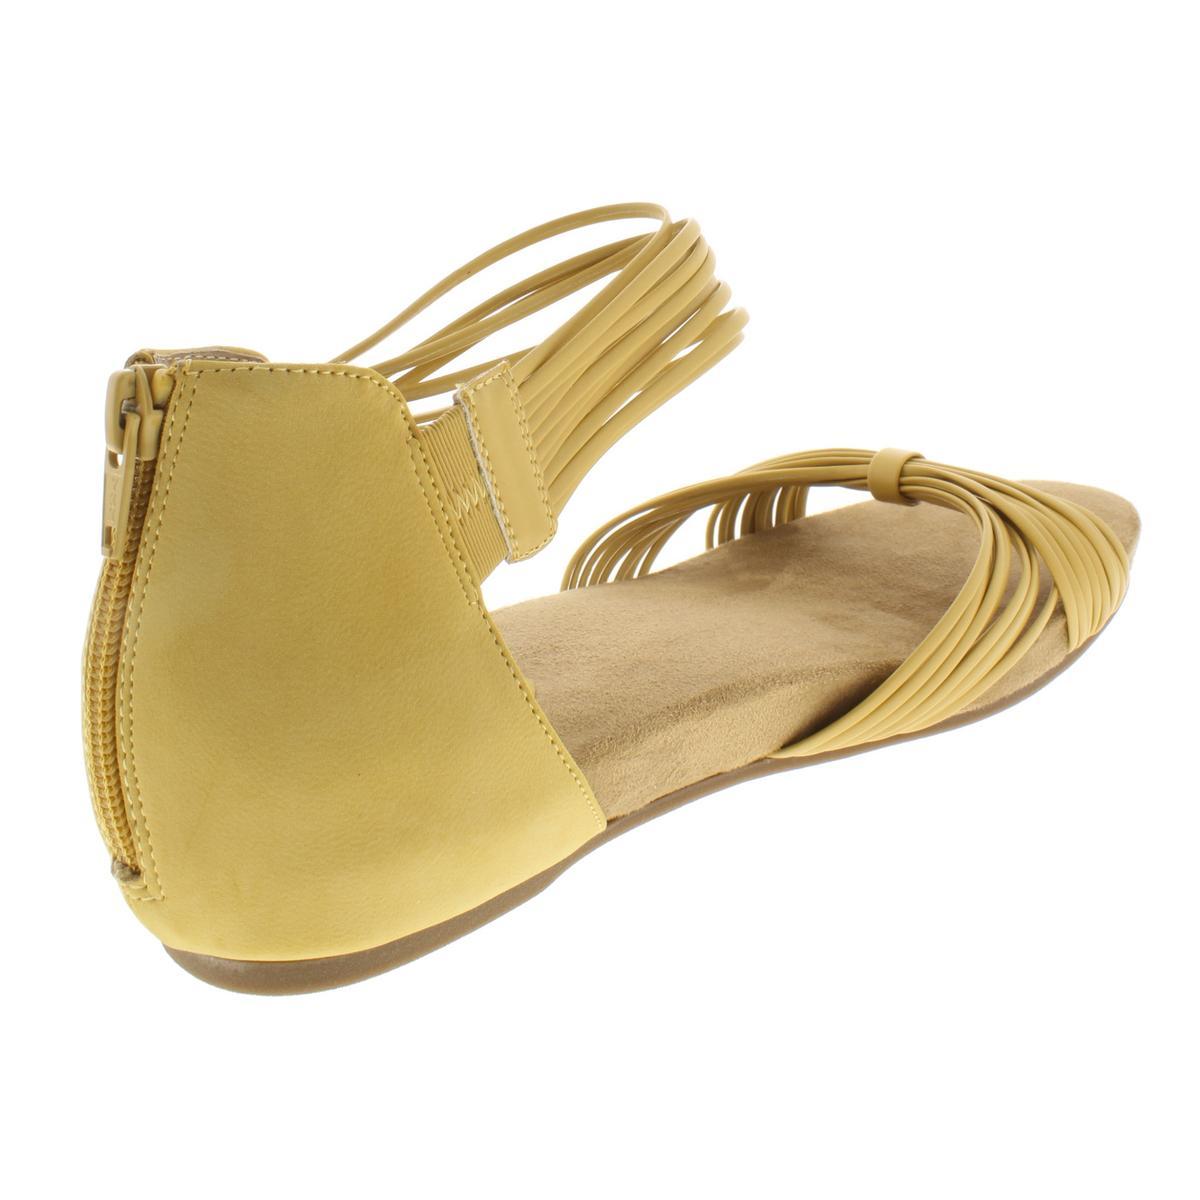 Giani-Bernini-Womens-Jhene-Strappy-Criss-Cross-Sandals-Shoes-Flats-BHFO-9685 thumbnail 8